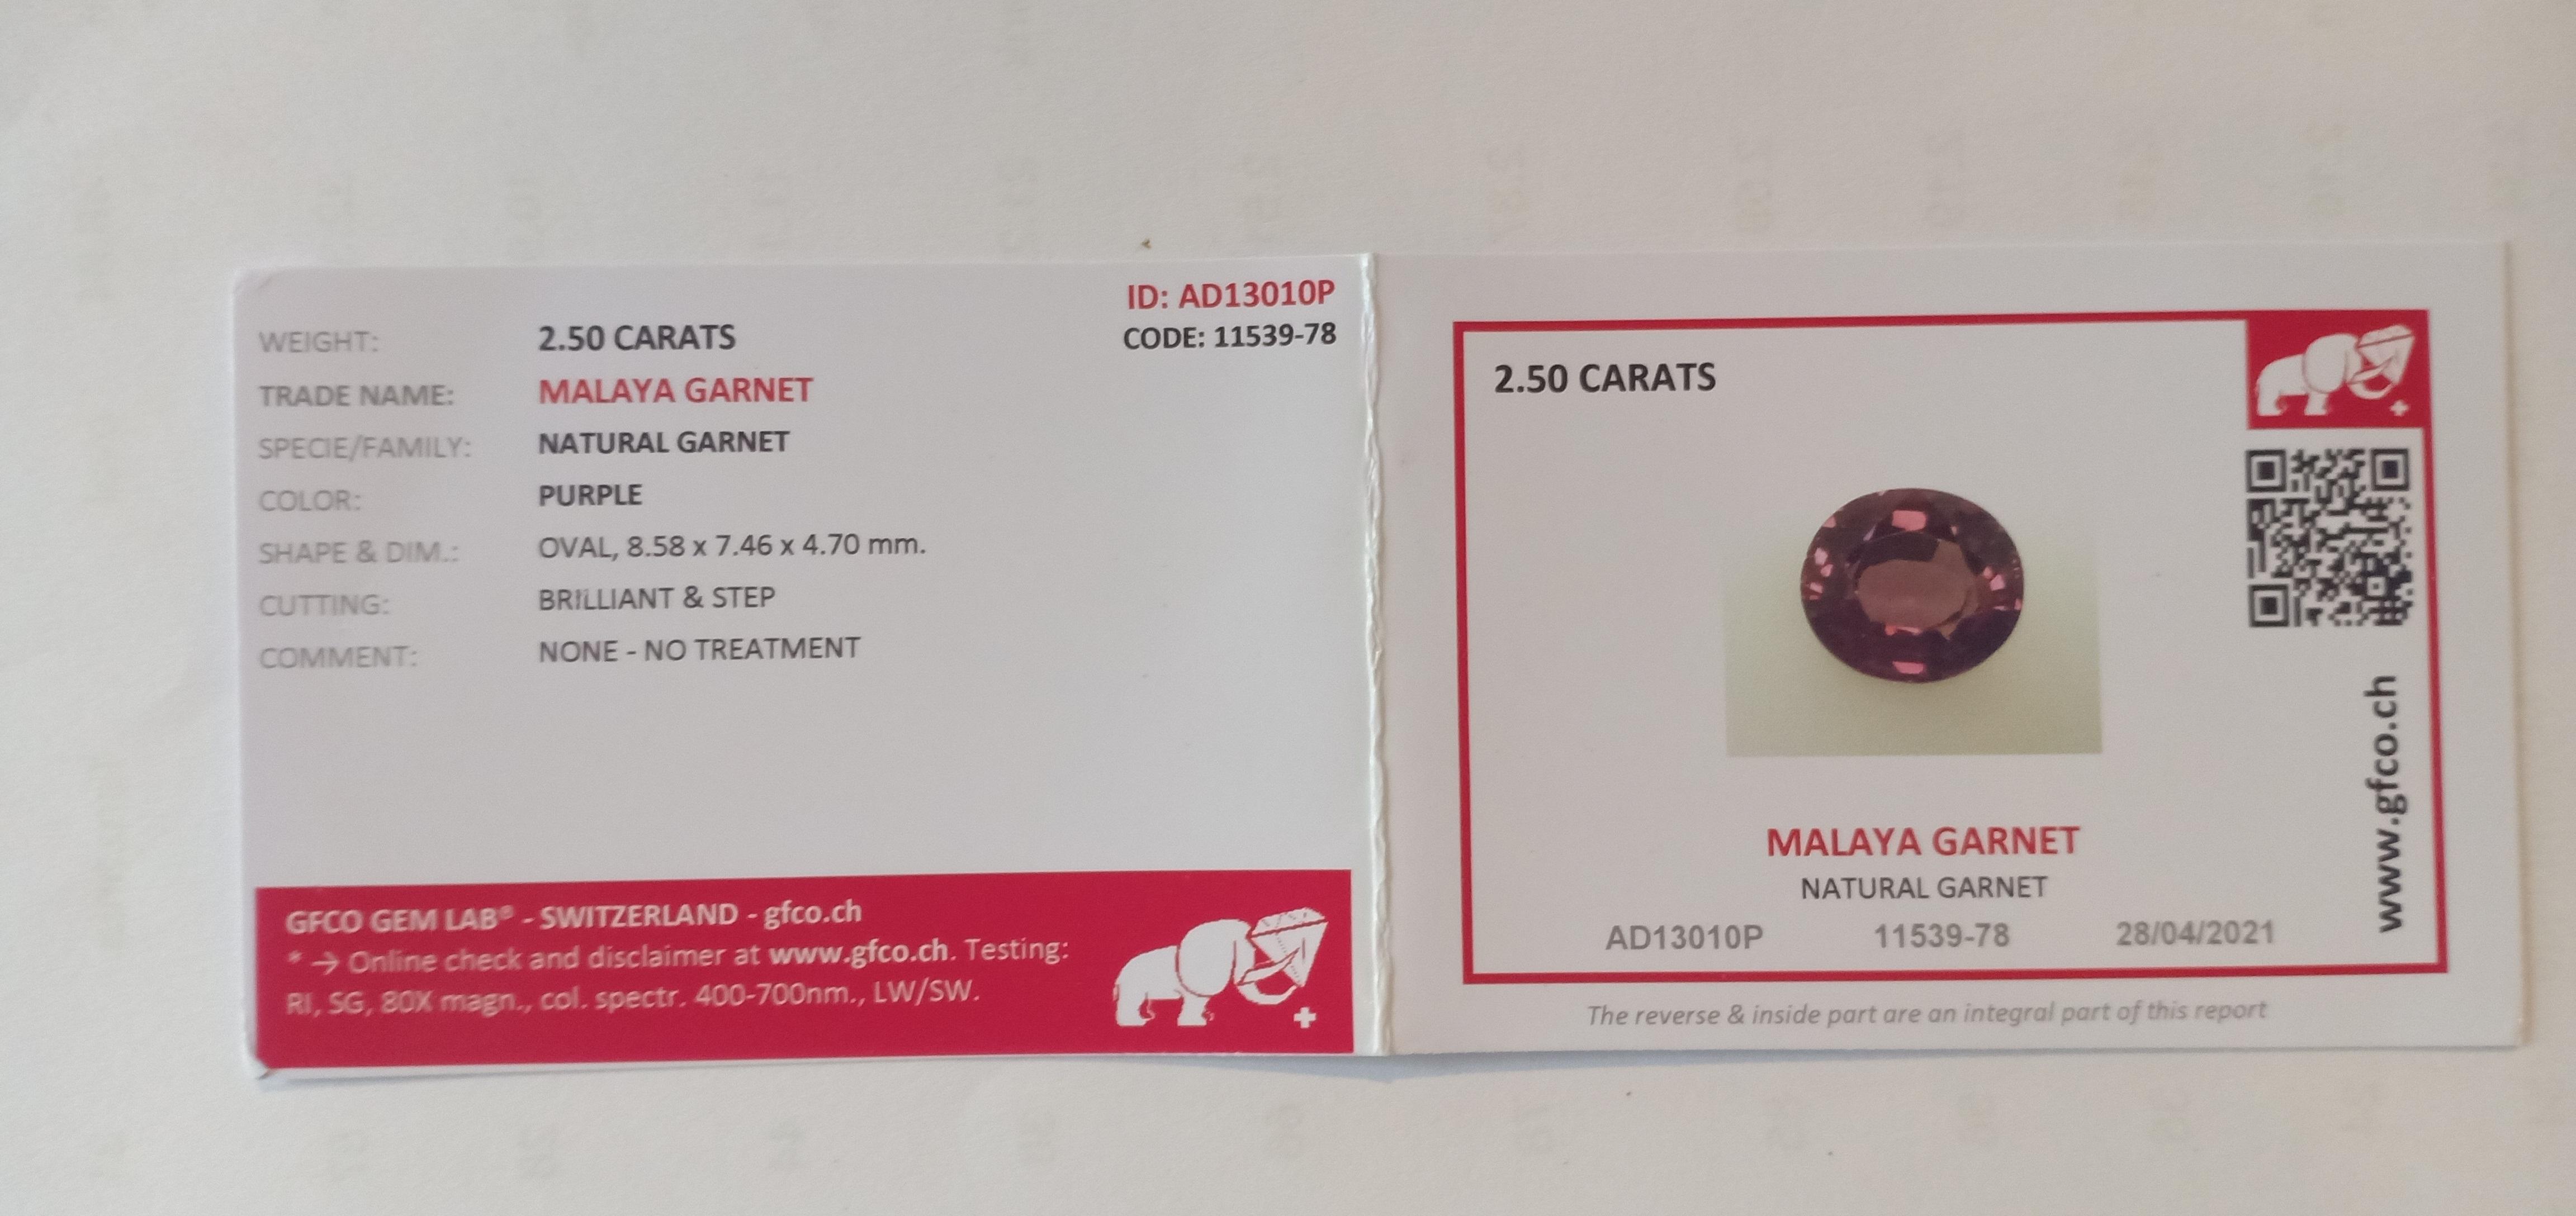 NATURAL MALAYA MAHENGE GARNET - TANZANIA - 2.50 Cts - Certificate GFCO Swiss Laboratory - Image 3 of 3